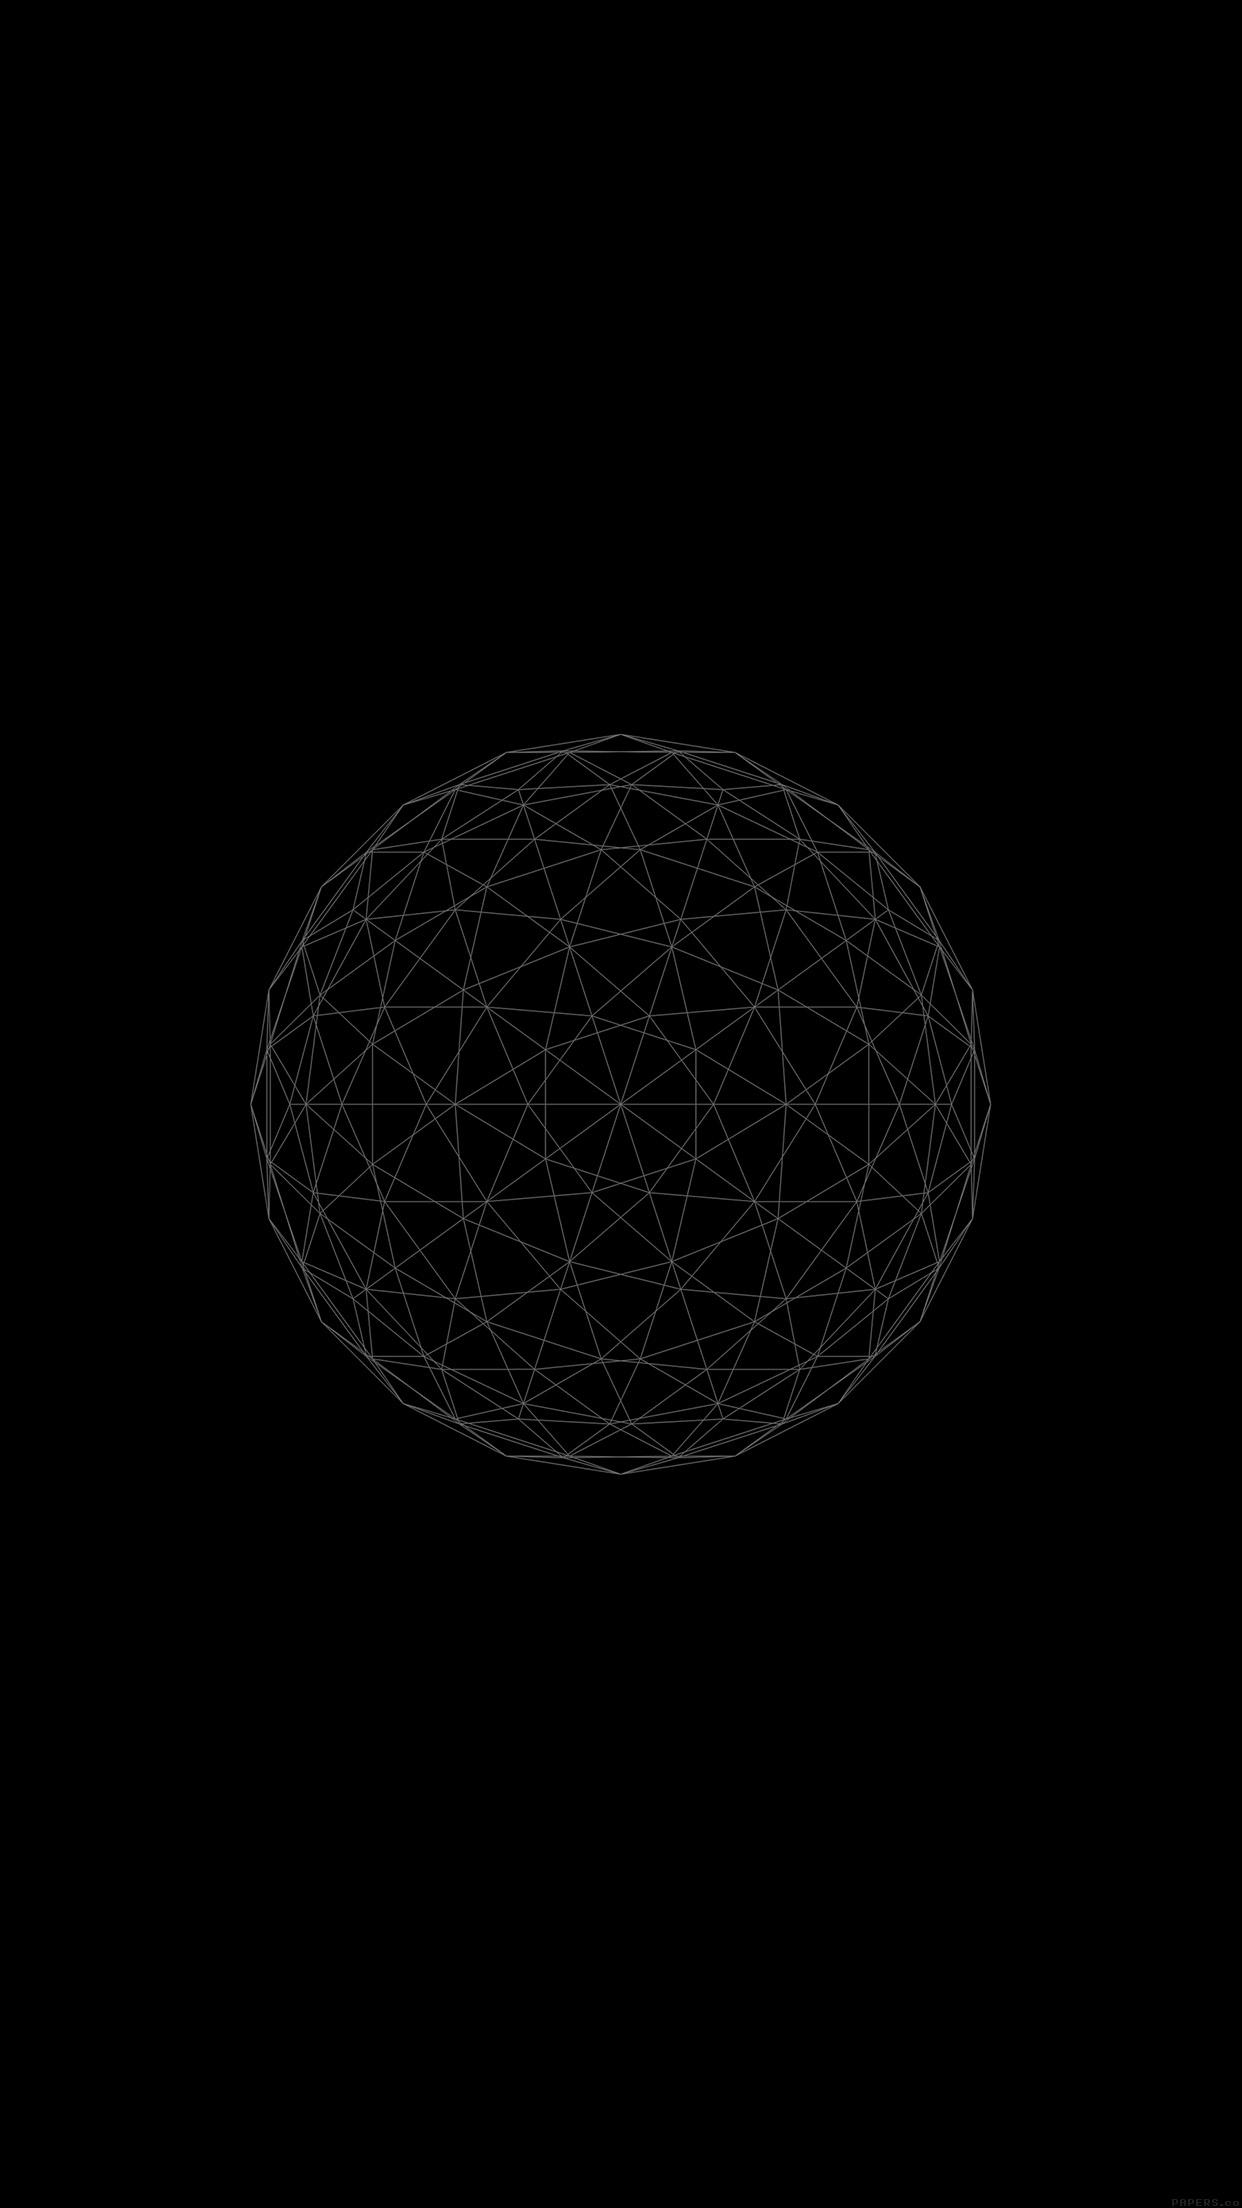 ve32-line-abstract-circle-3d-art-wallpaper